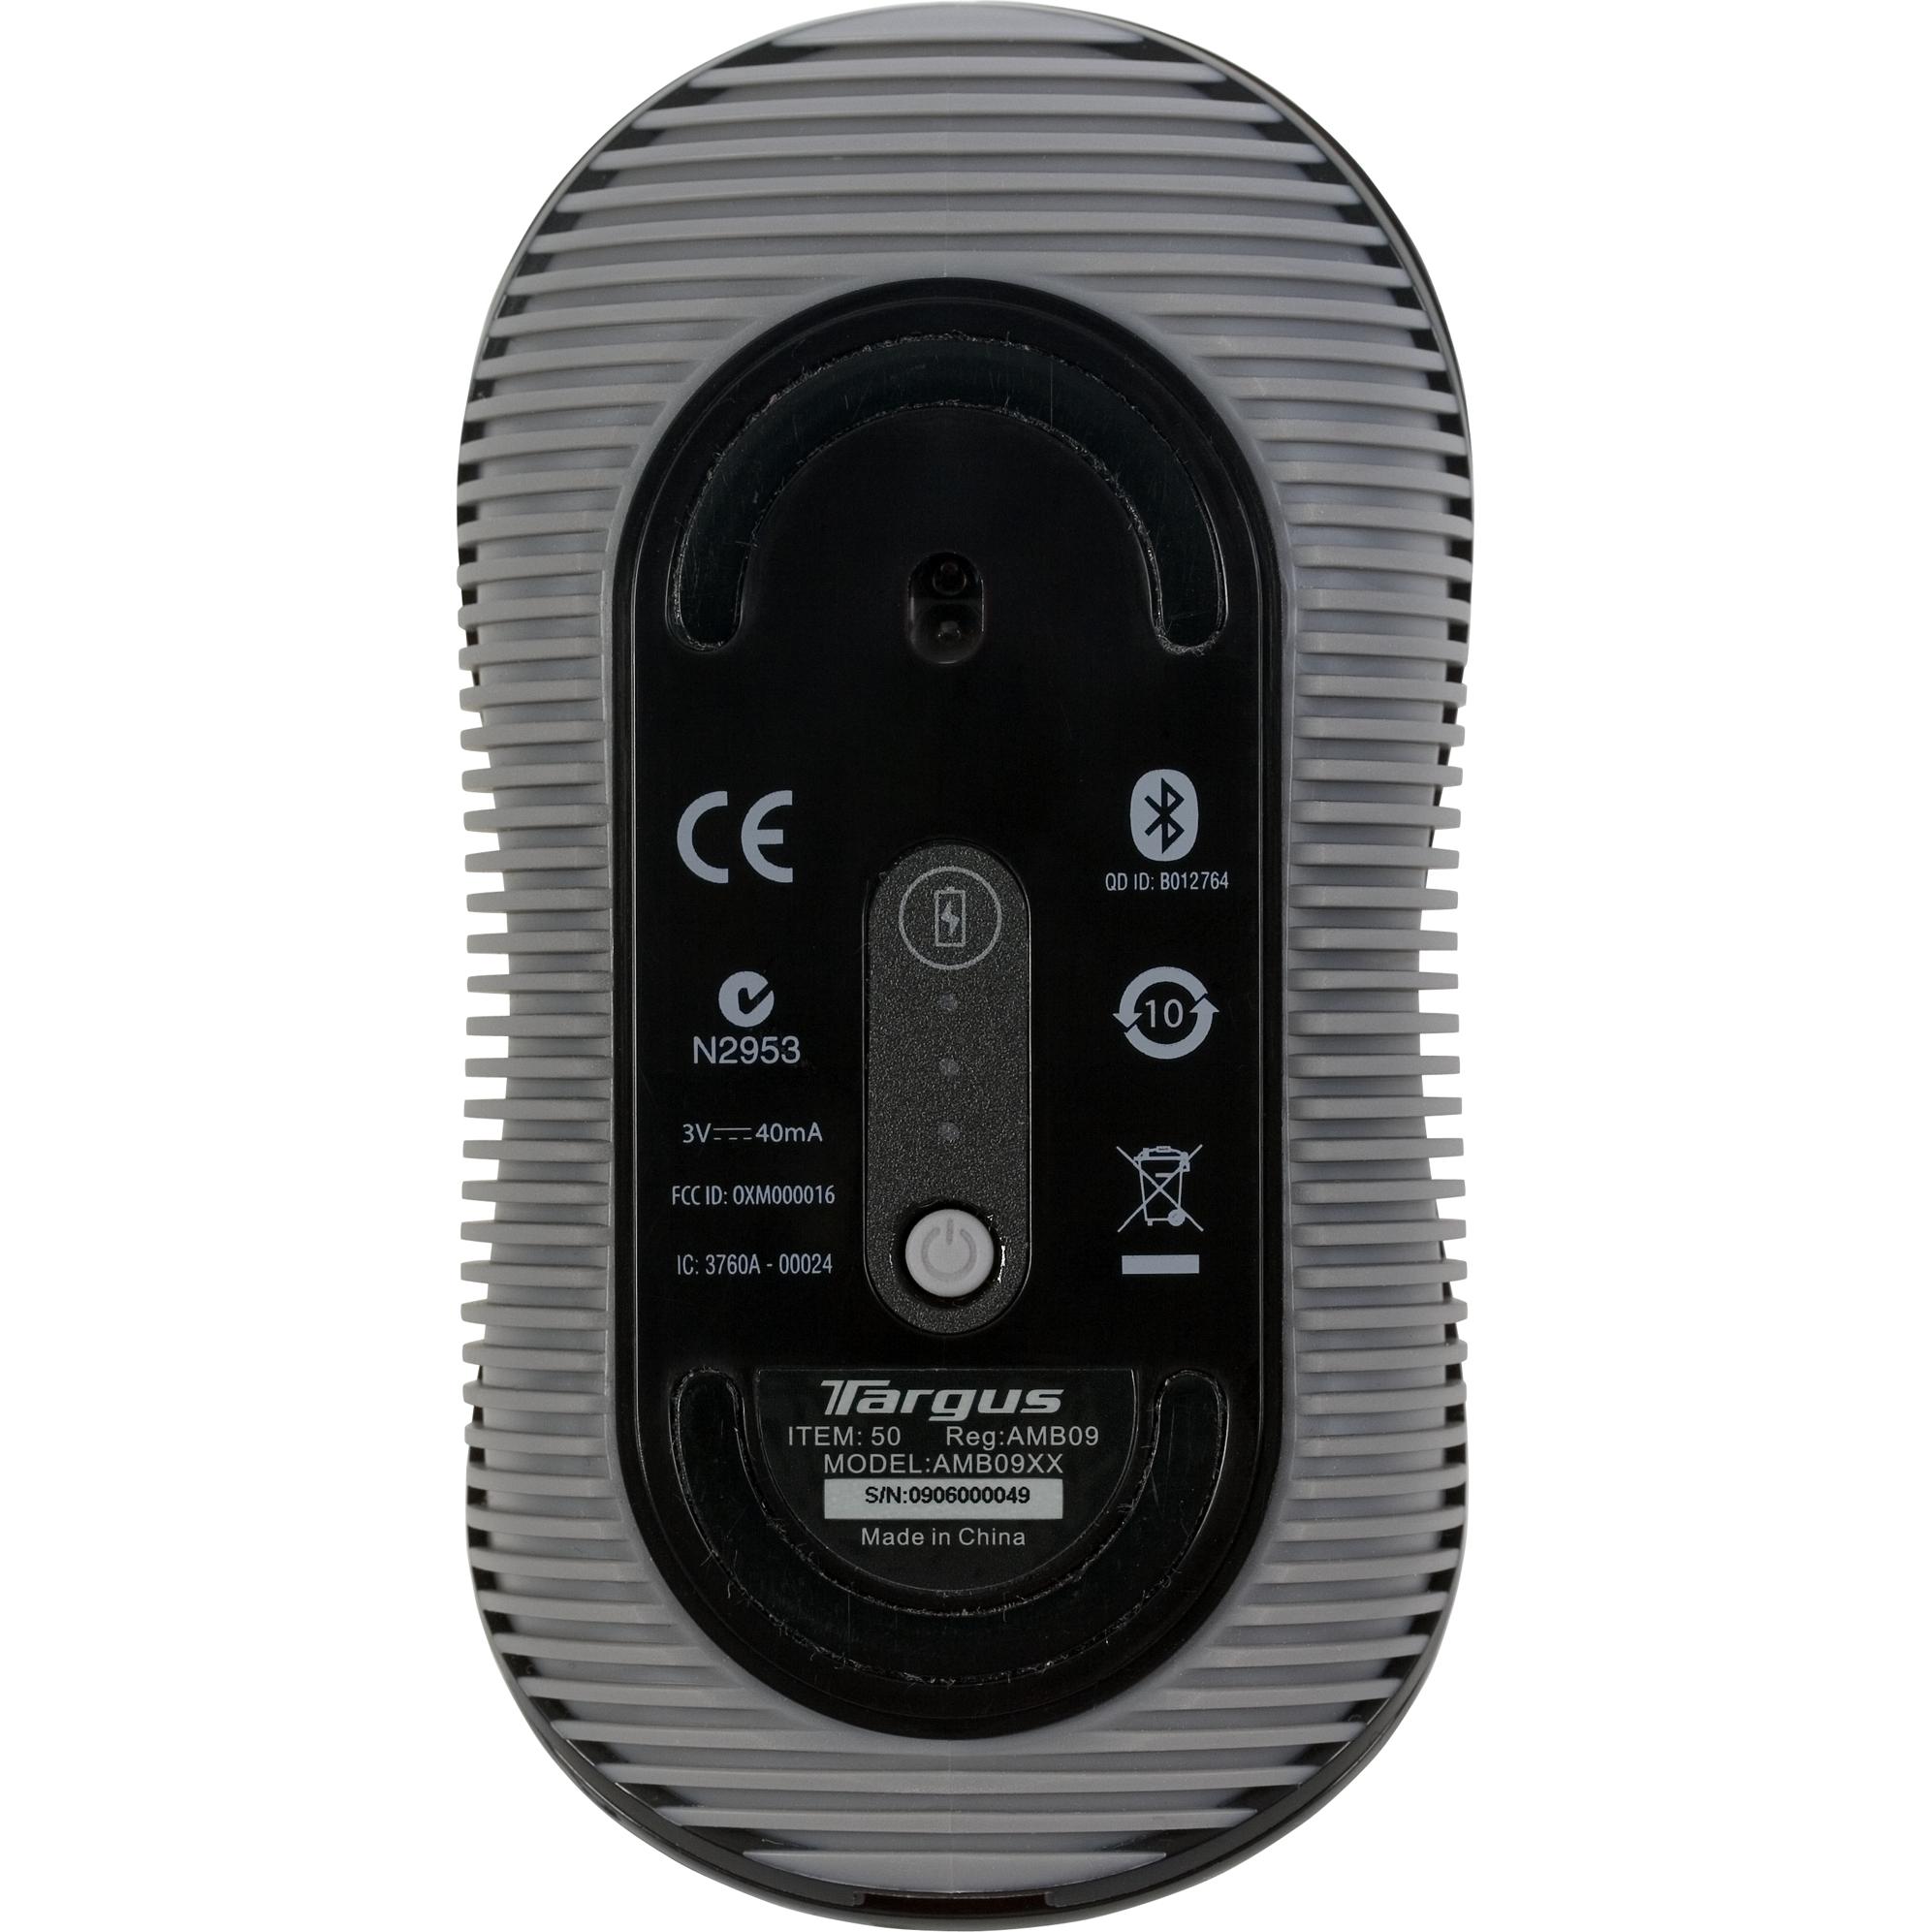 Bluetooth 174 Comfort Laser Mouse Black Gray Amb09us